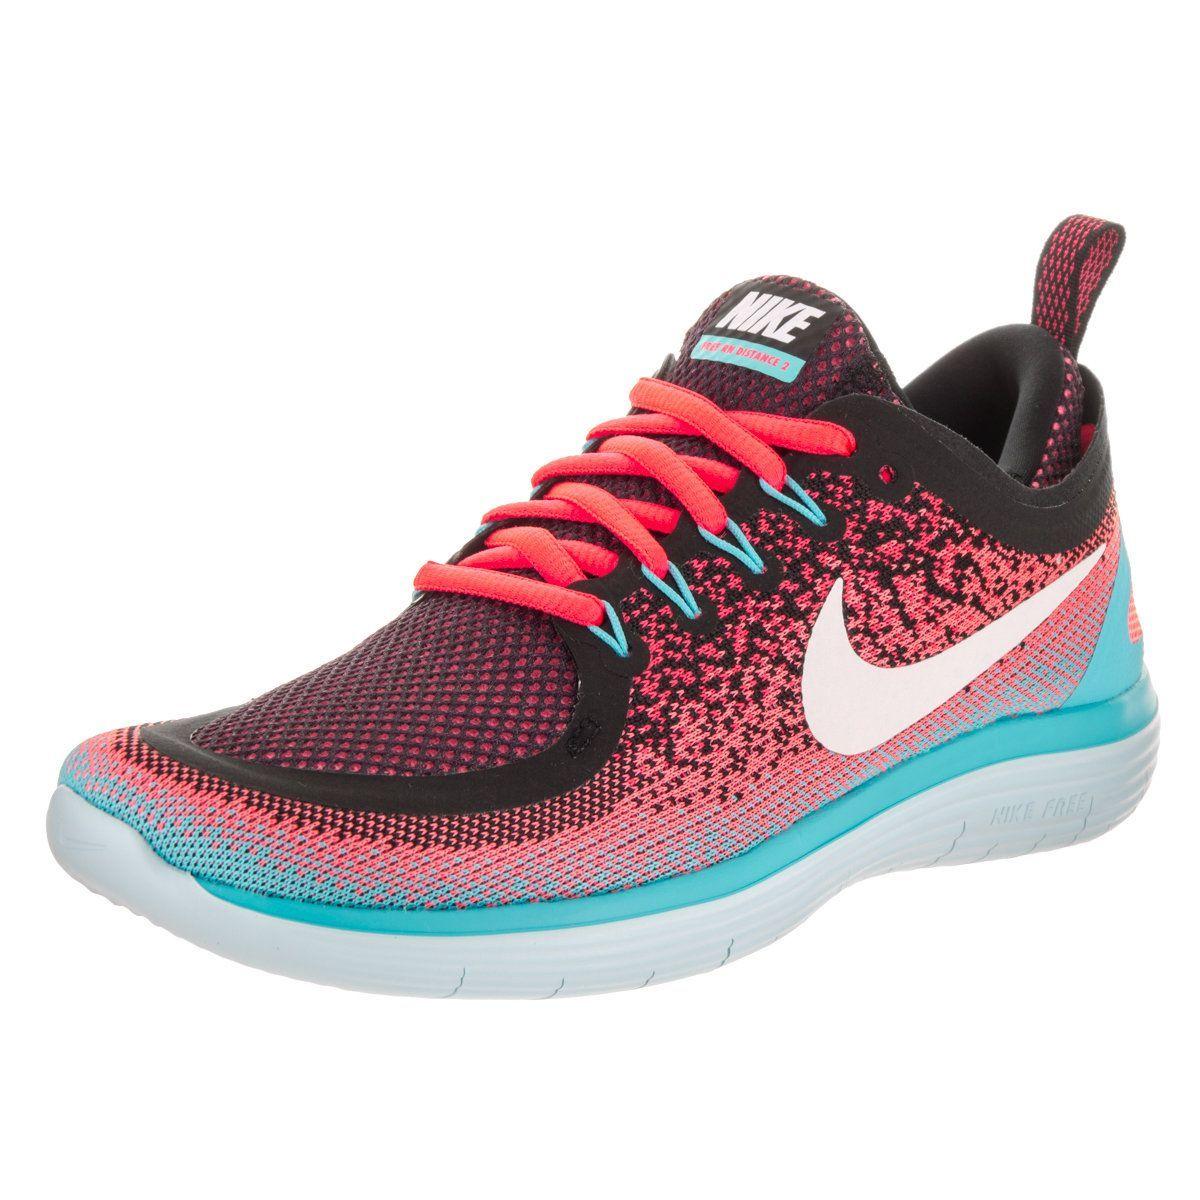 953b2f3c8e77 Nike Women s Free RN Distance 2 Running Shoes in 2019